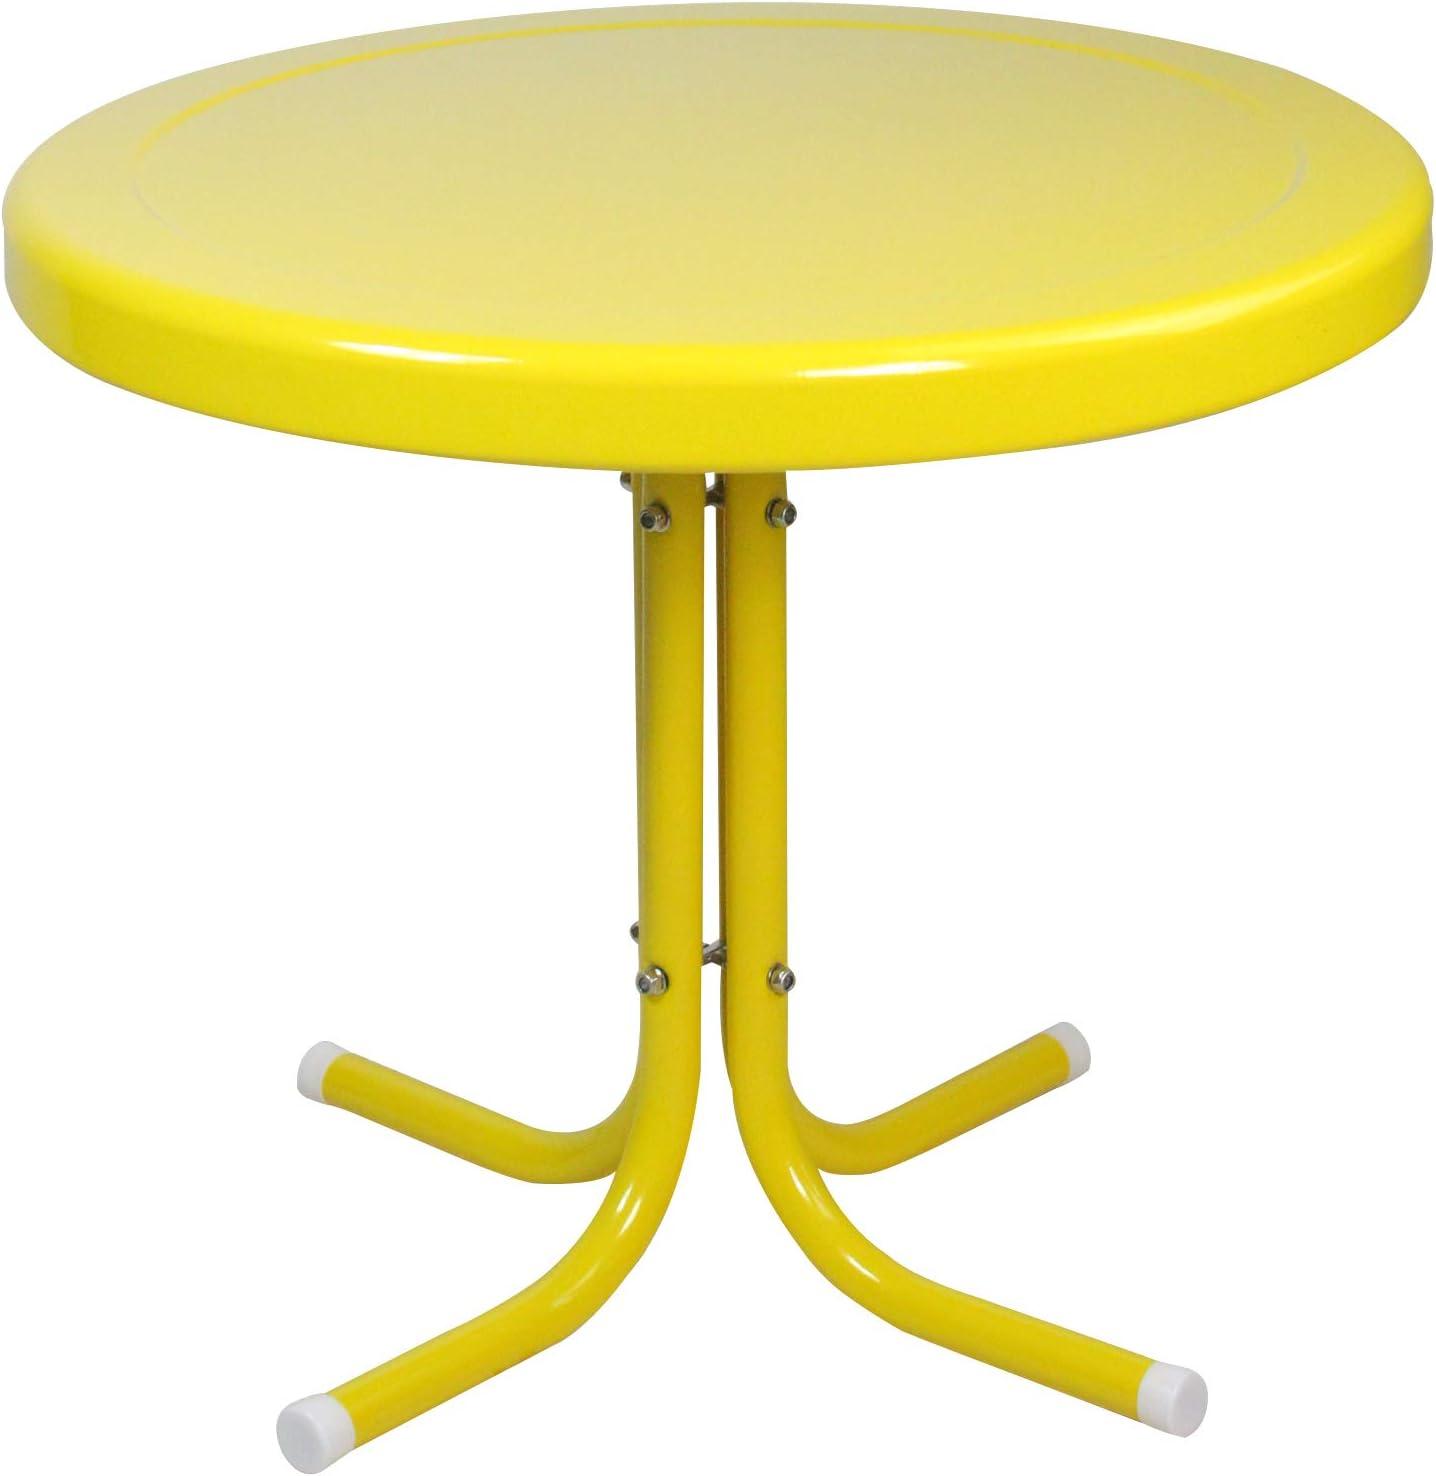 LB International Outdoor Retro Metal Tulip Side Table, Yellow